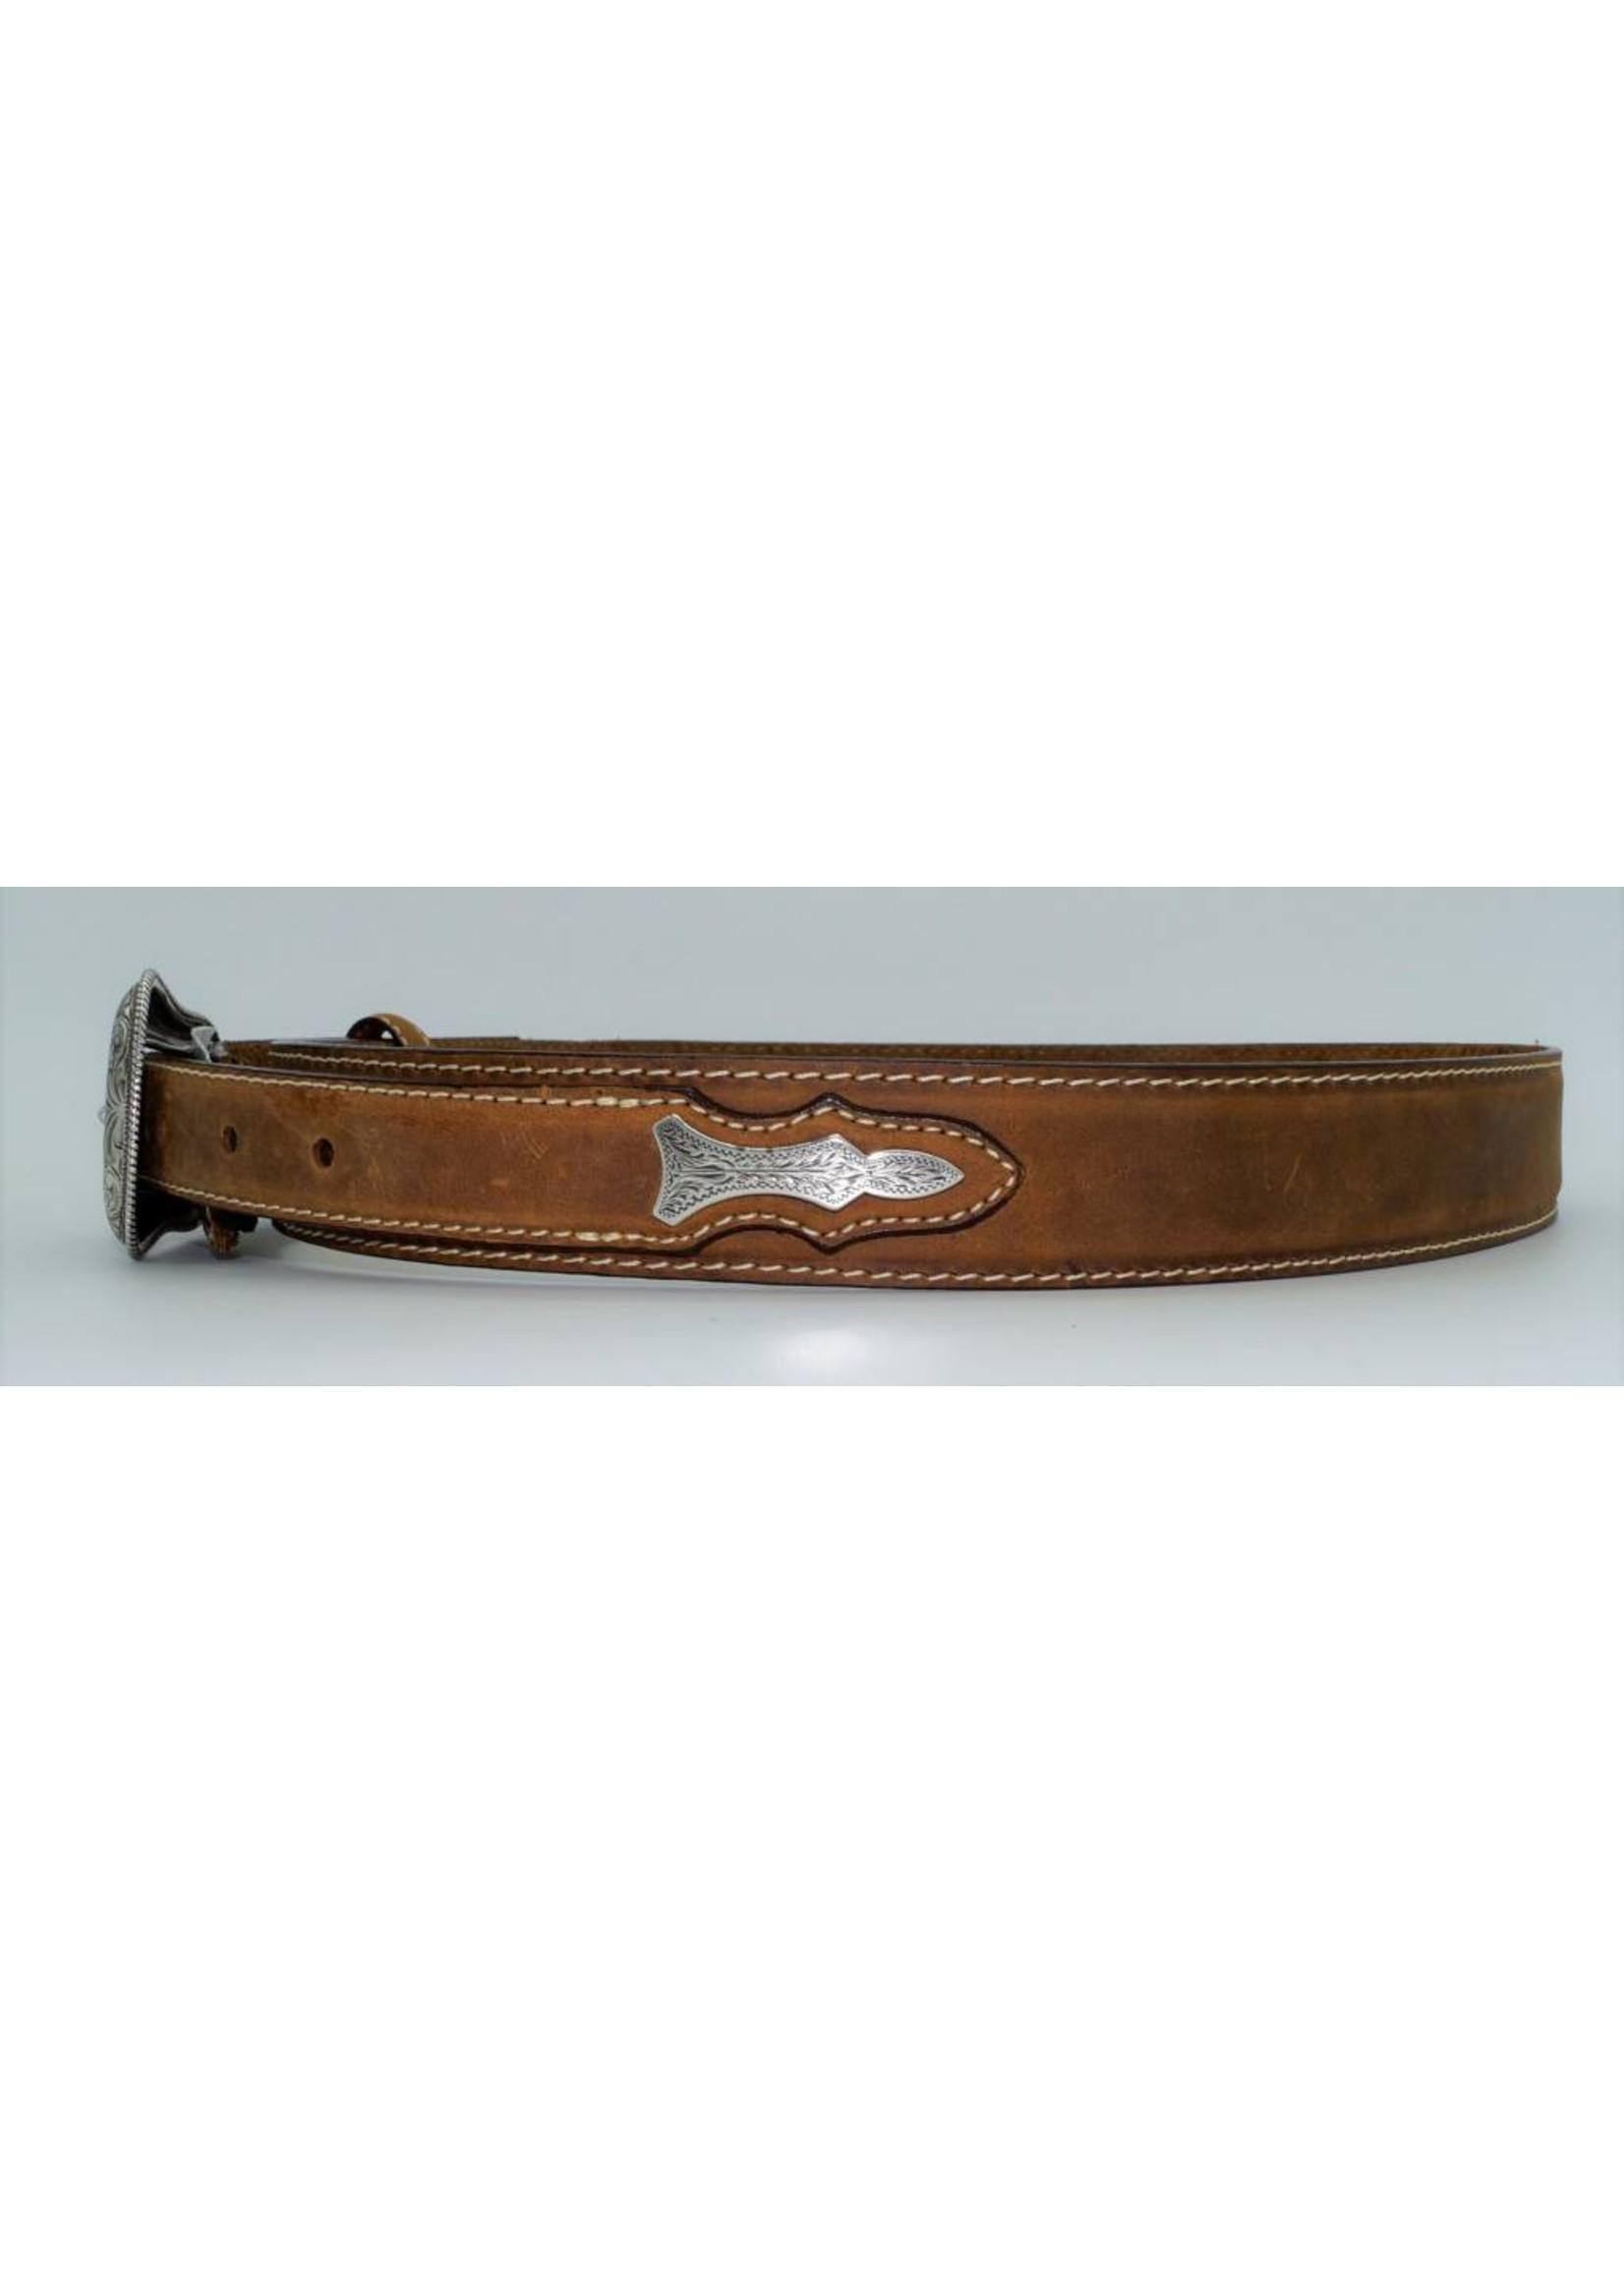 Justin Ridgepoint Brown Belt C13625